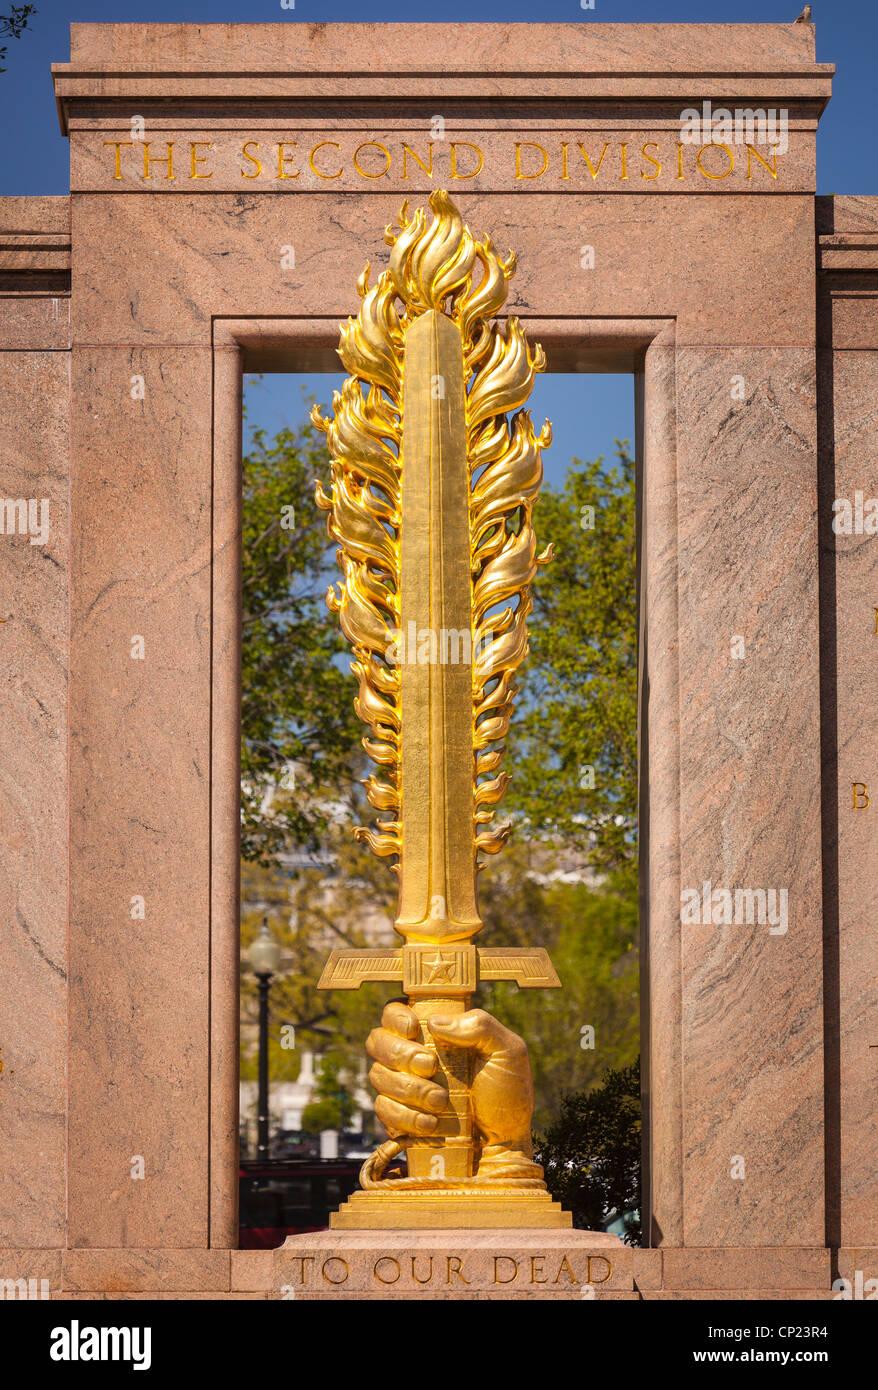 WASHINGTON, DC, USA - The Second Division World War I Memorial. - Stock Image